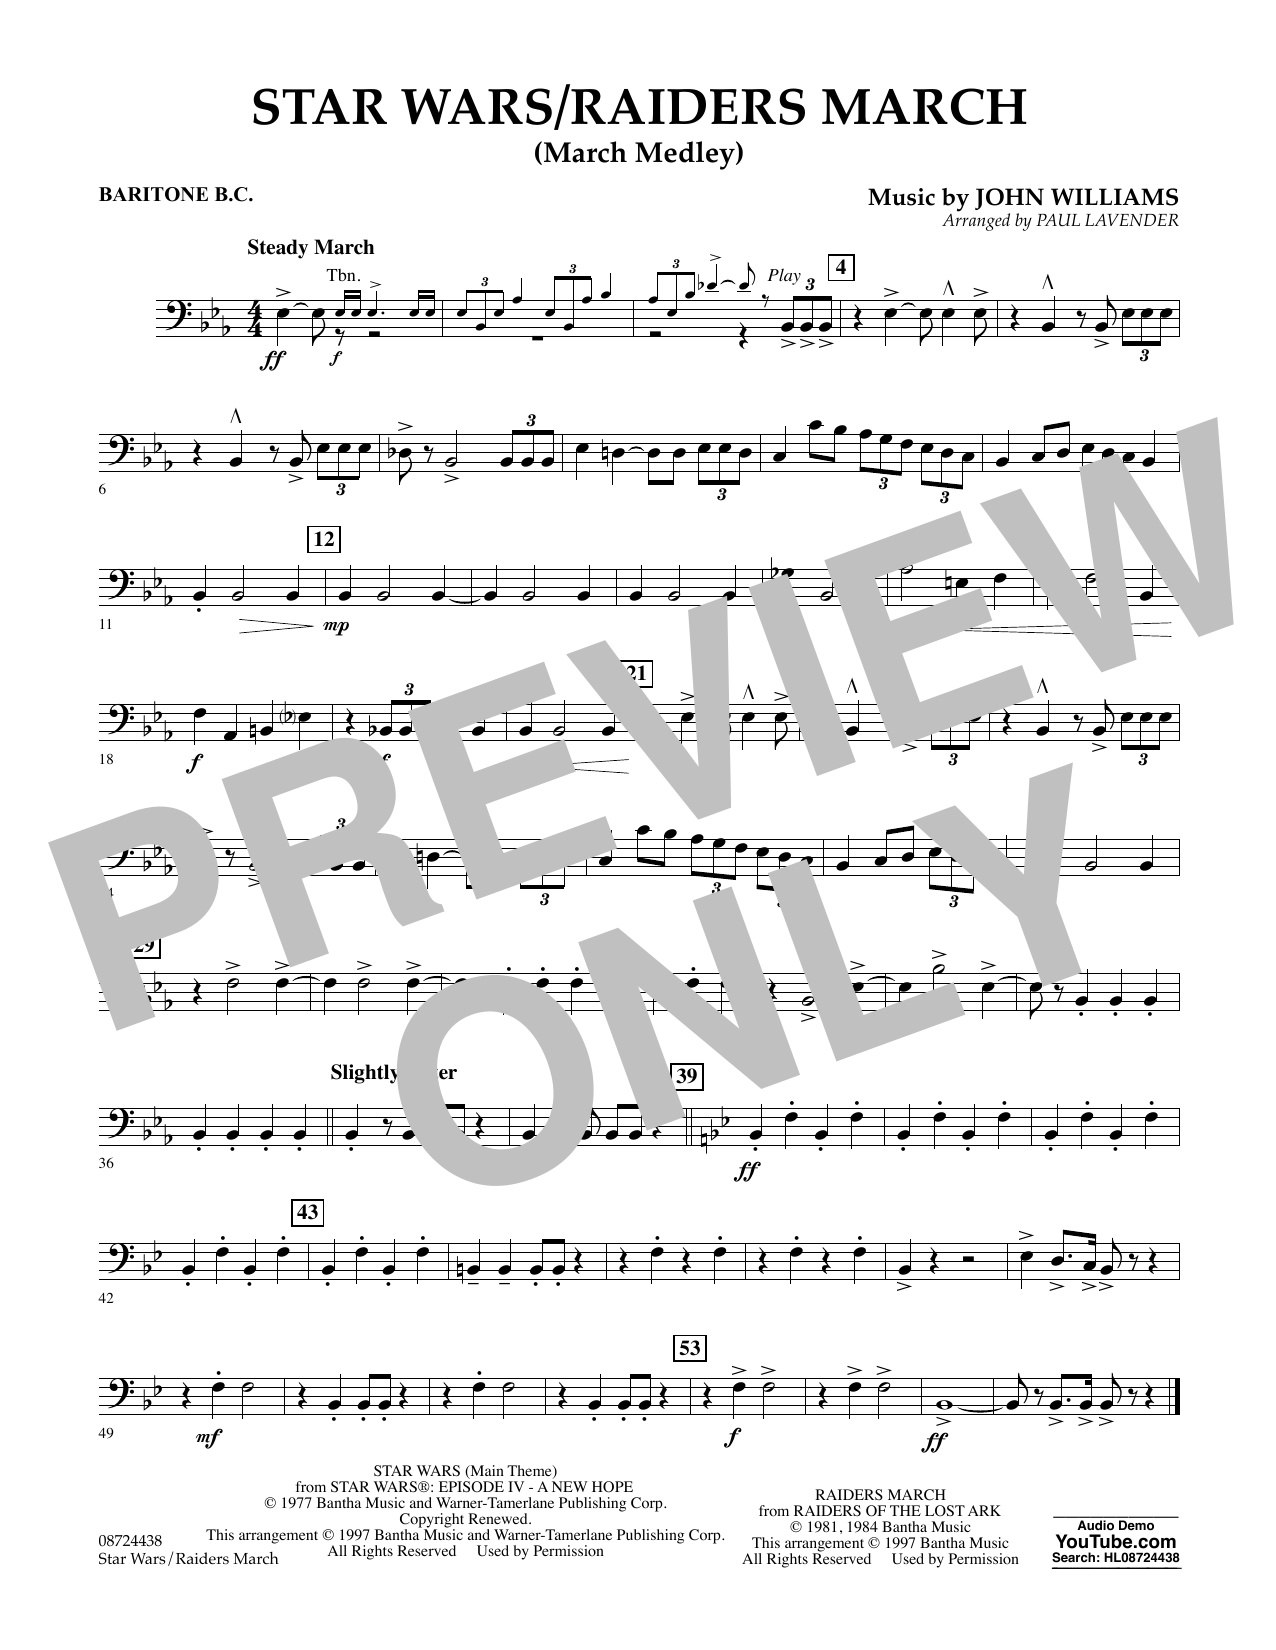 Star Wars/Raiders March - Baritone B.C. Sheet Music